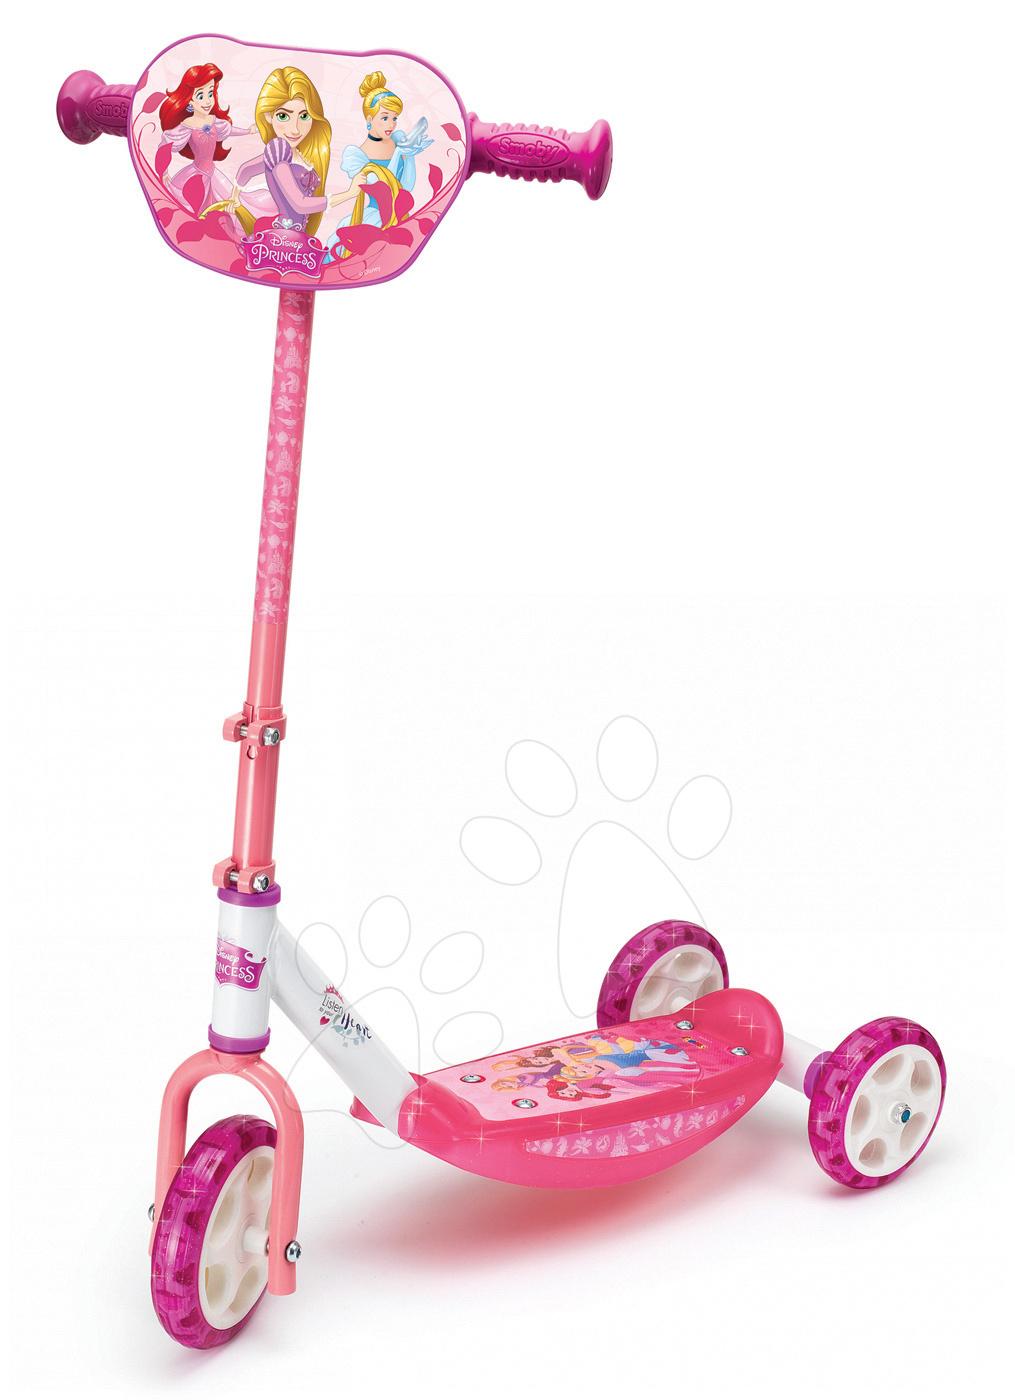 Romobili na tri kotača - Romobil na tri kotača Disney Princeze Smoby ružičasti s podesivom visinom ručke